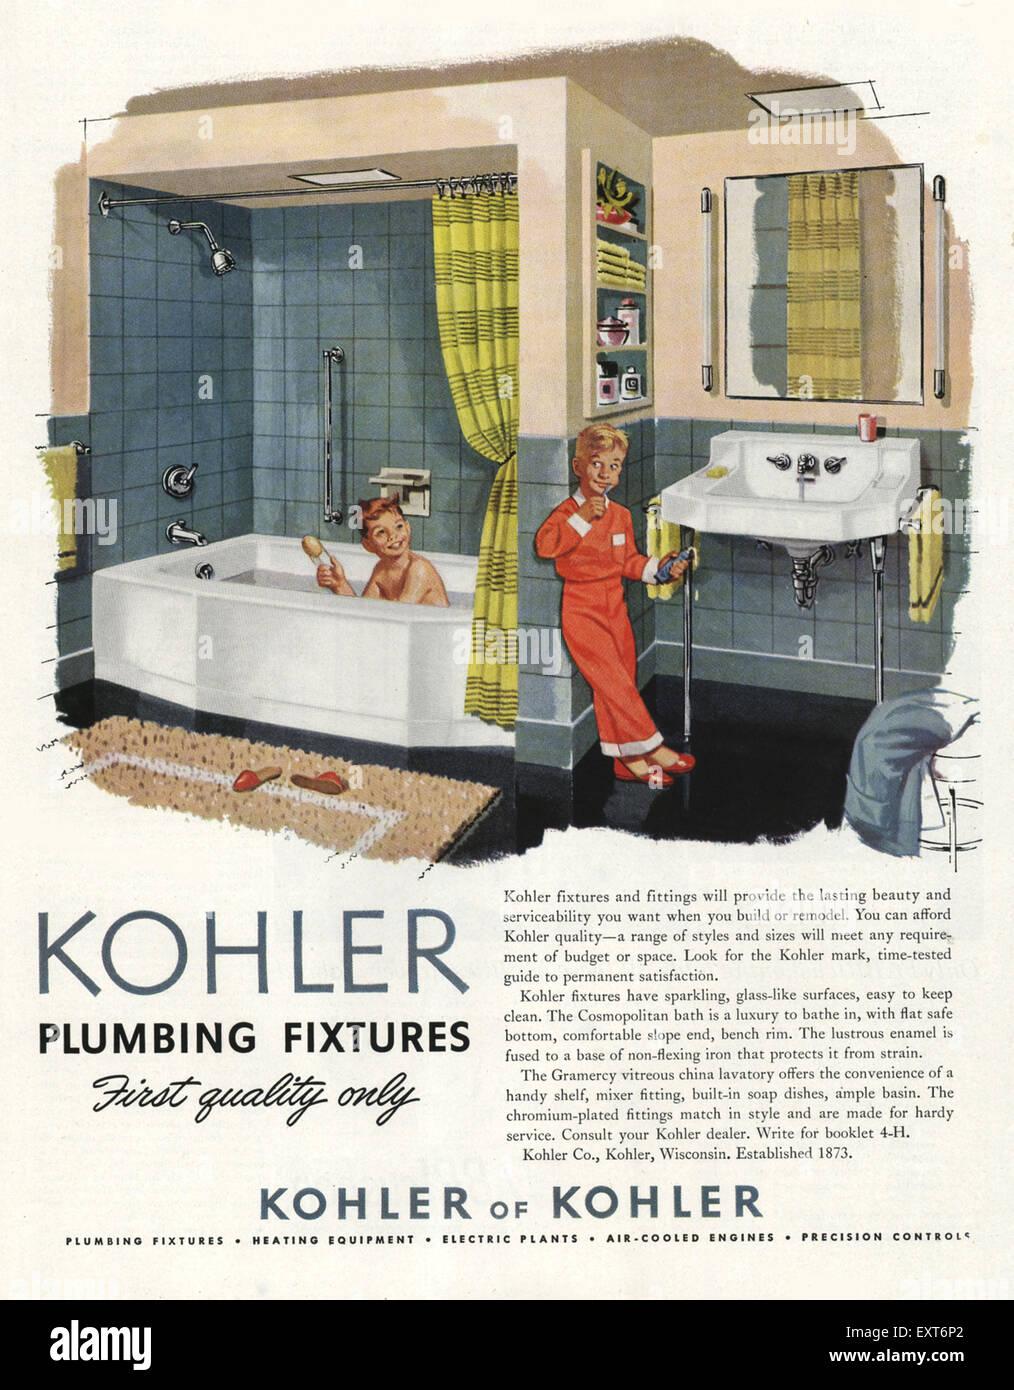 1950s USA Kohler Magazine Advert Stock Photo: 85354698 - Alamy